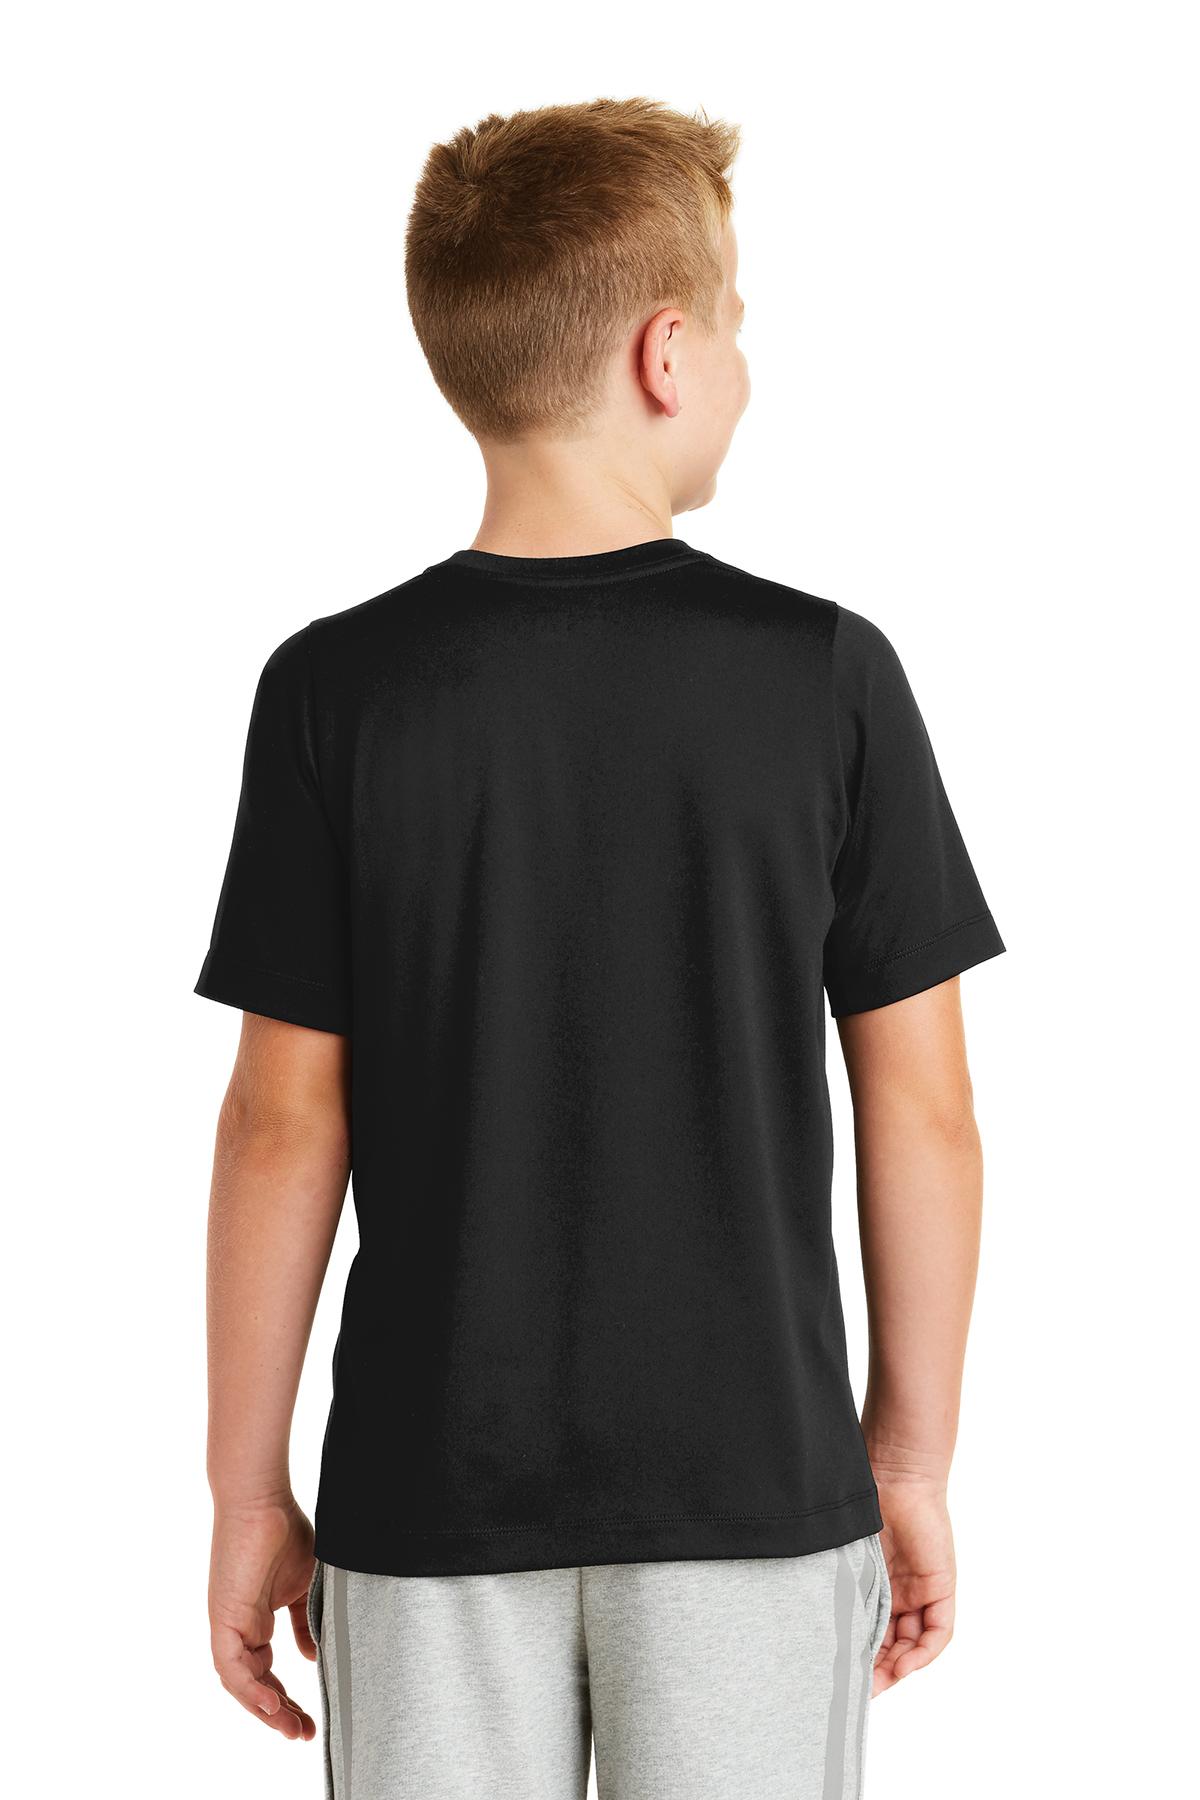 New Era Ne96196fa14 Team Logo Neosai T-Shirt Mixte Adulte